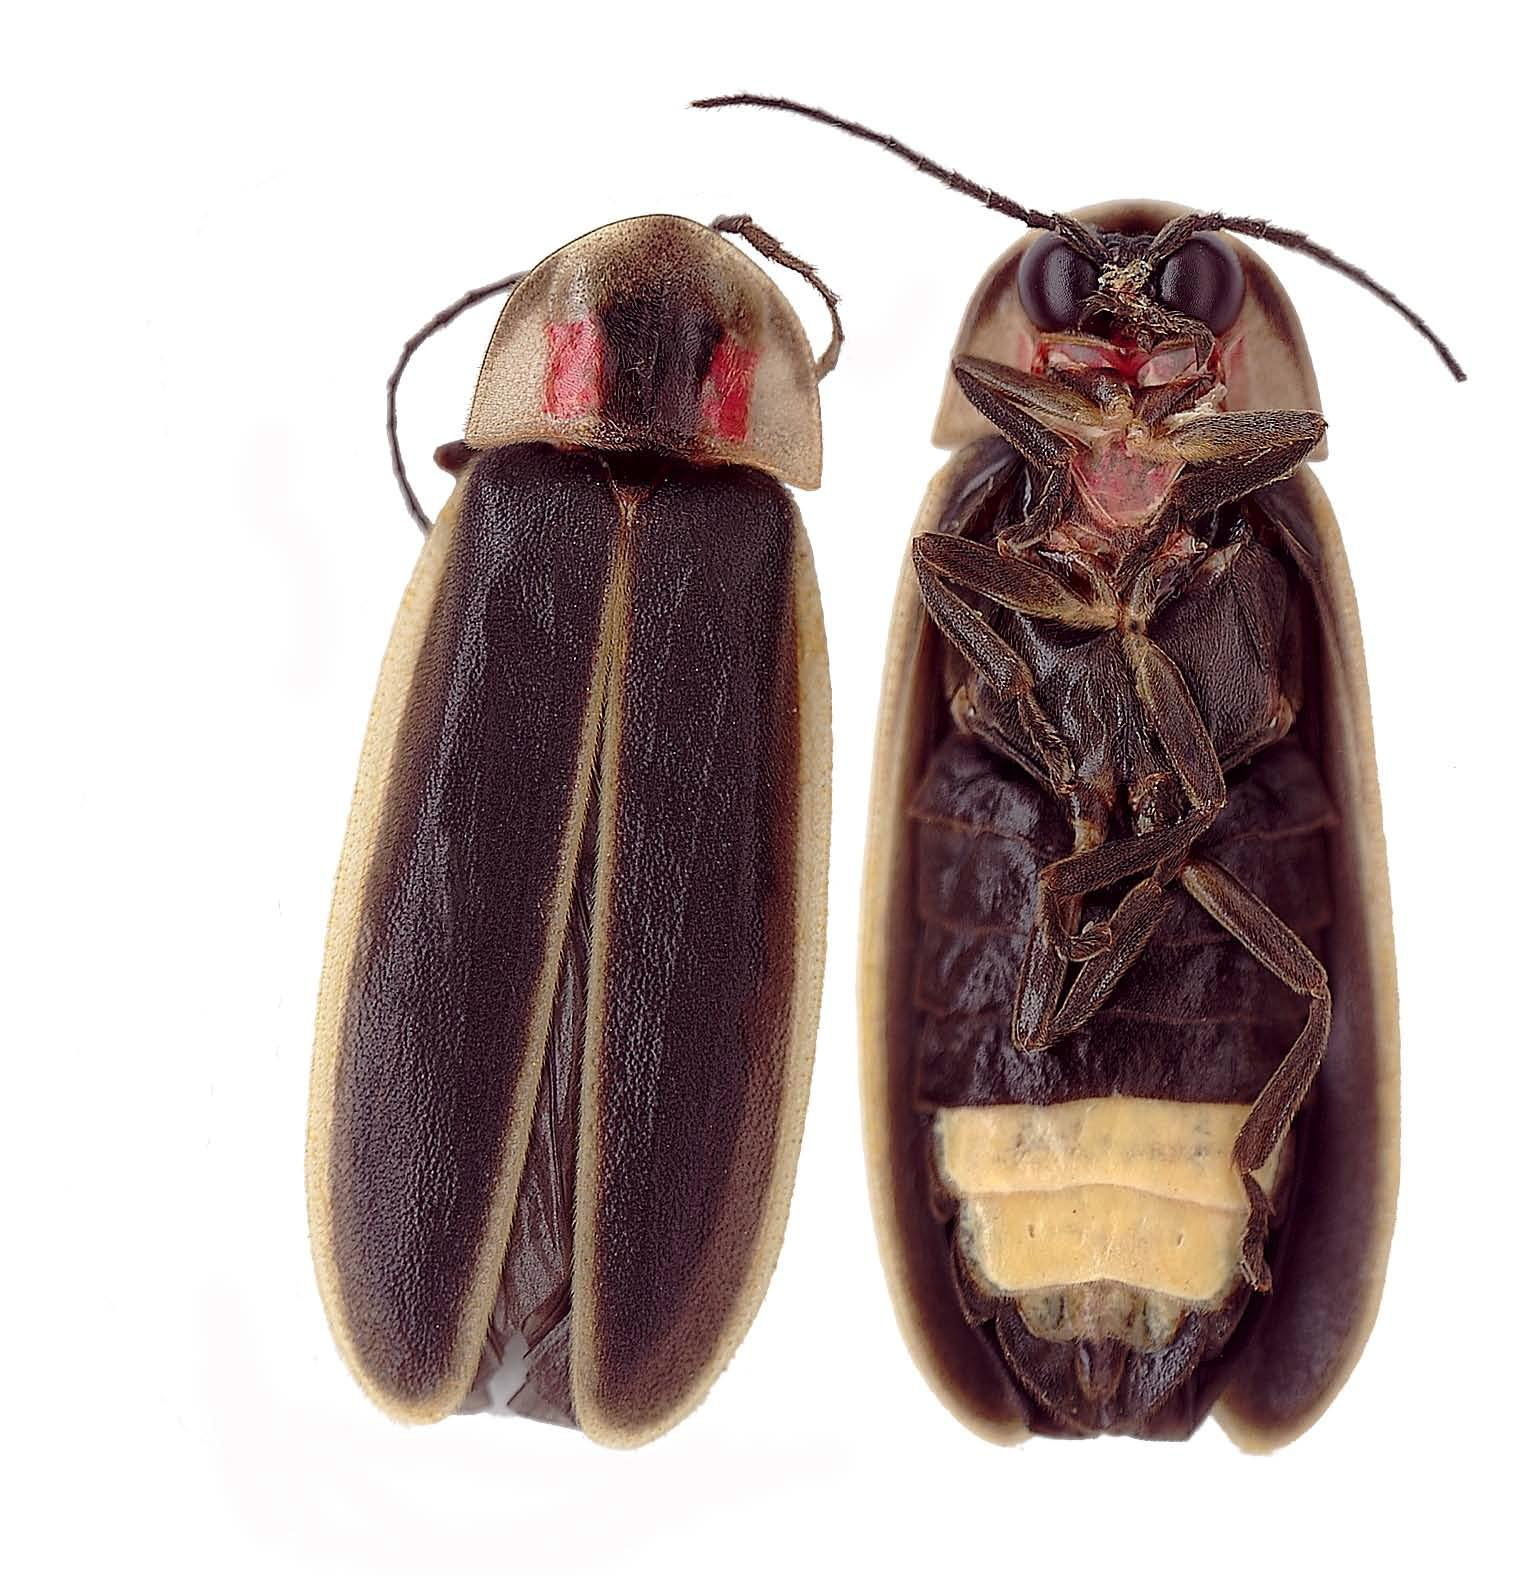 Firefly aka lightening Bug